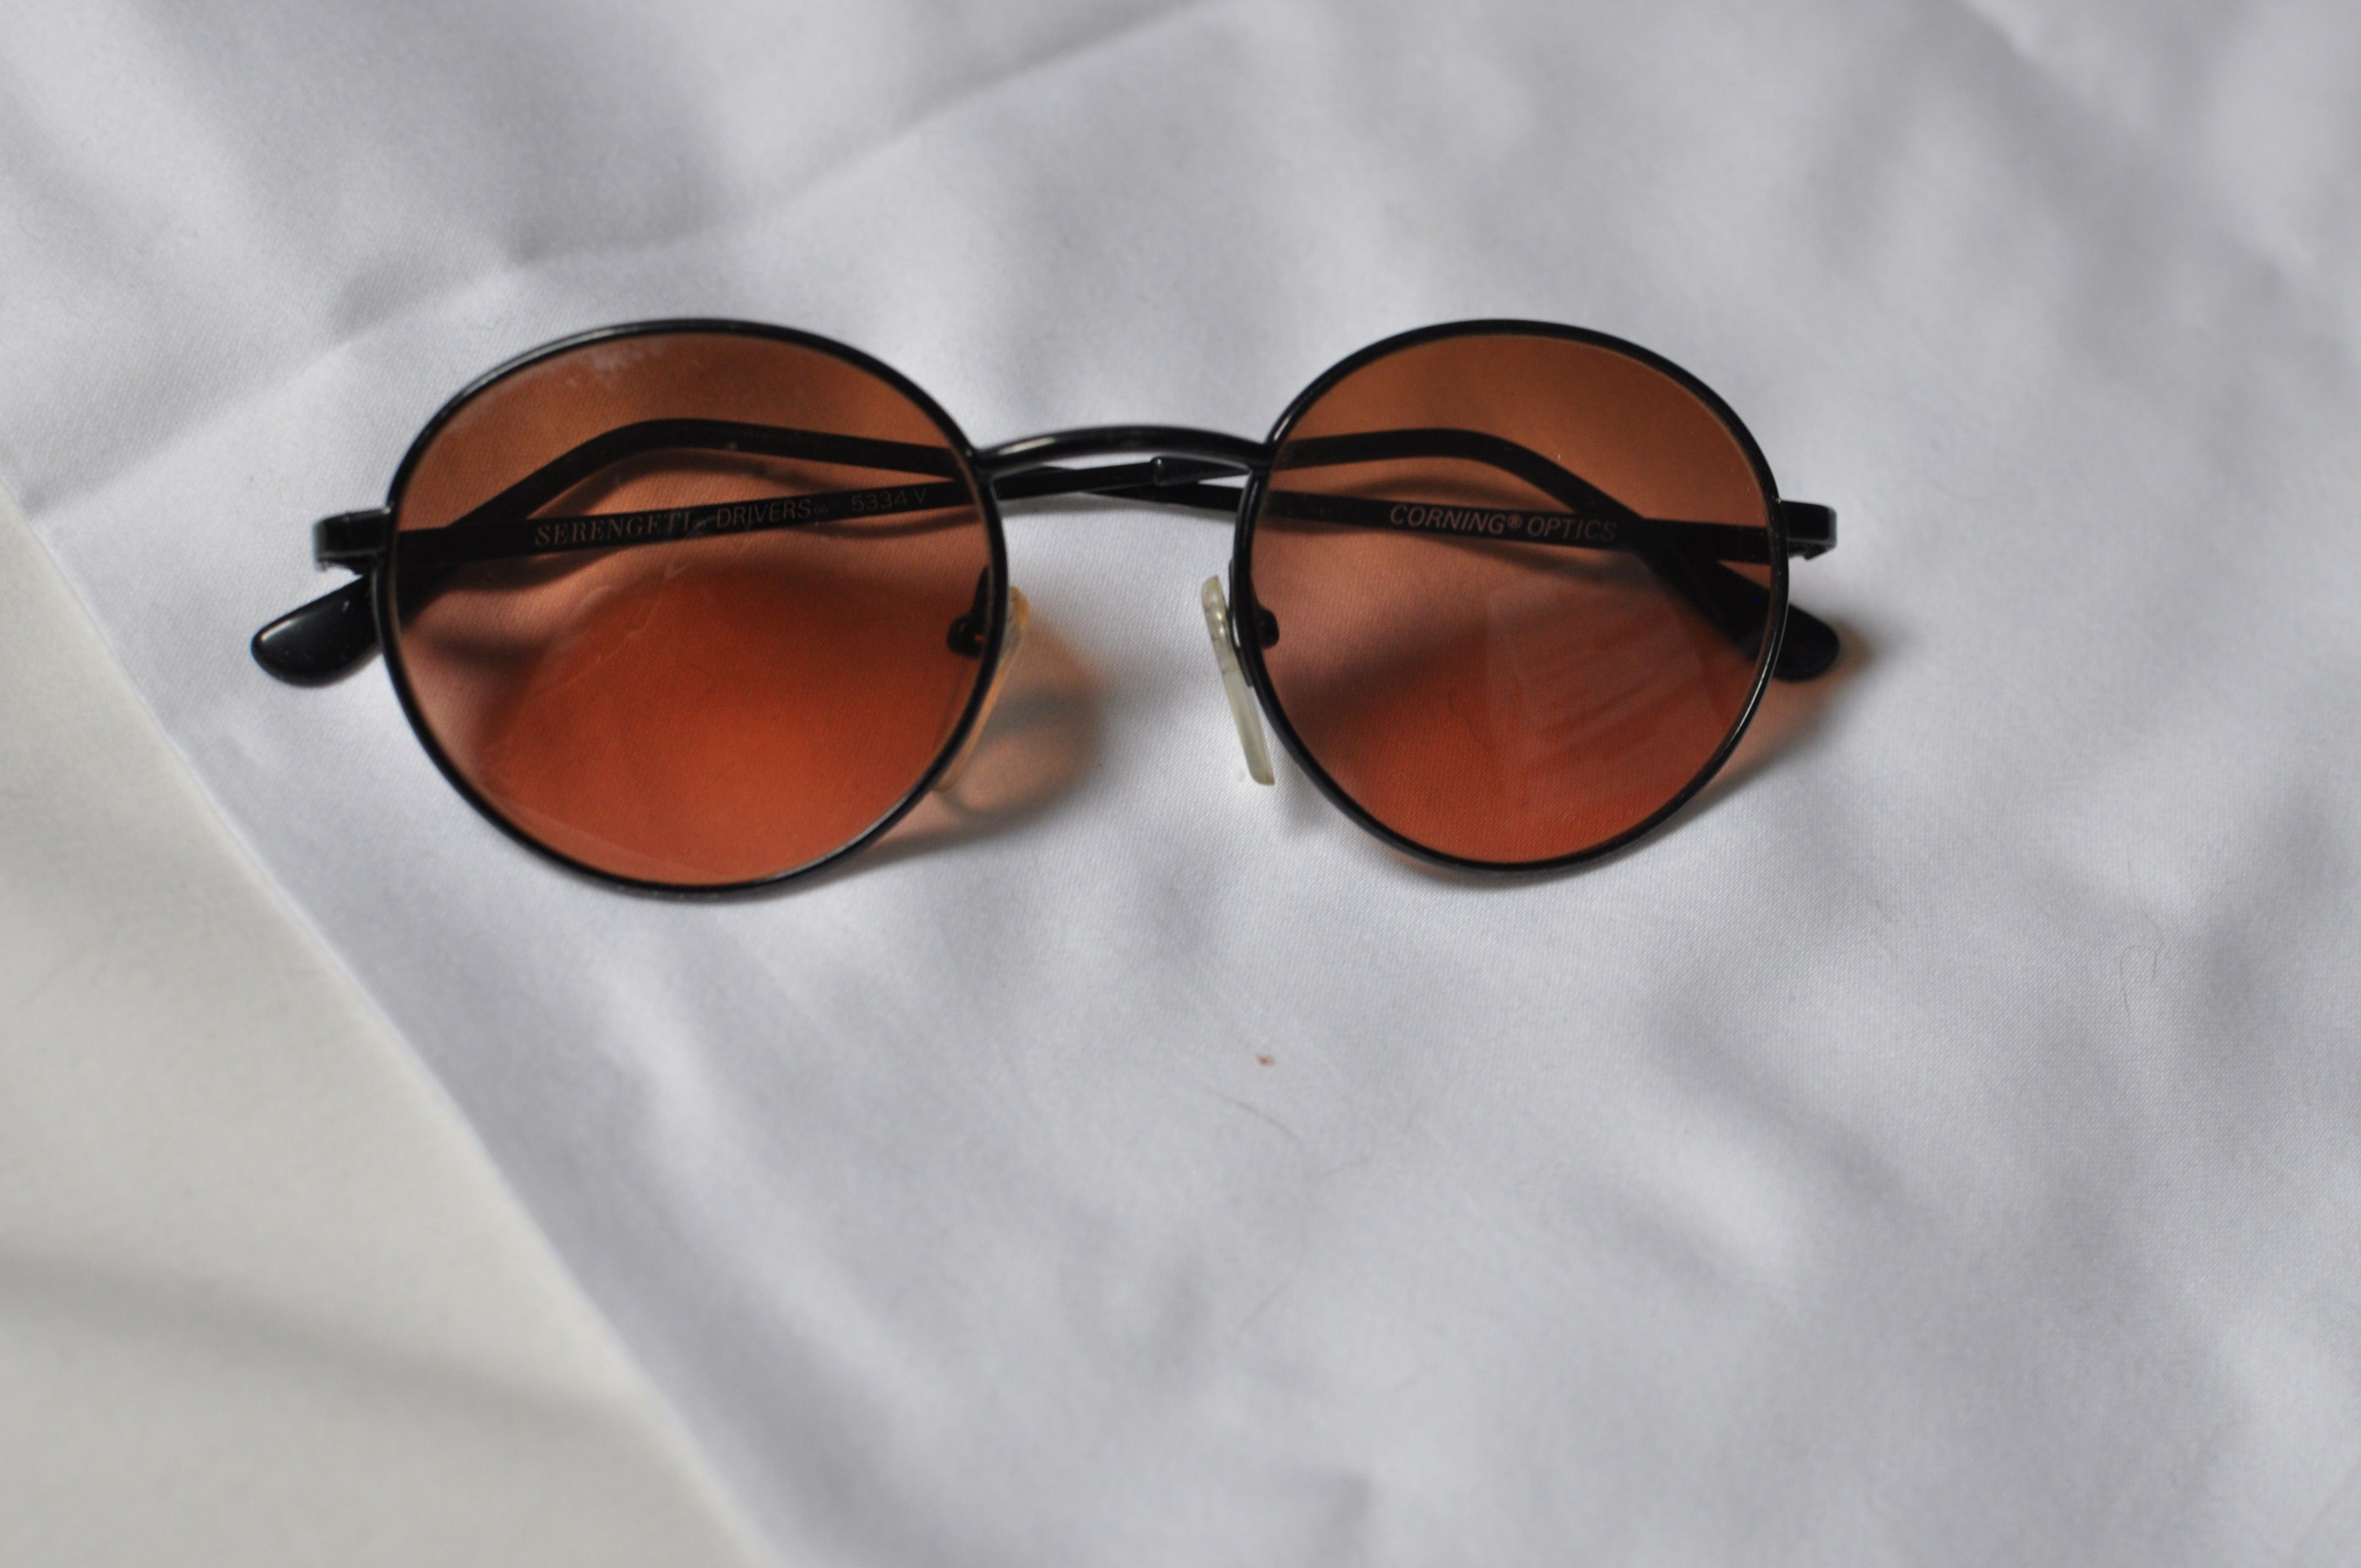 0376d4ae8eb4 Serengeti Drivers 5334V Sunglasses at 1stdibs